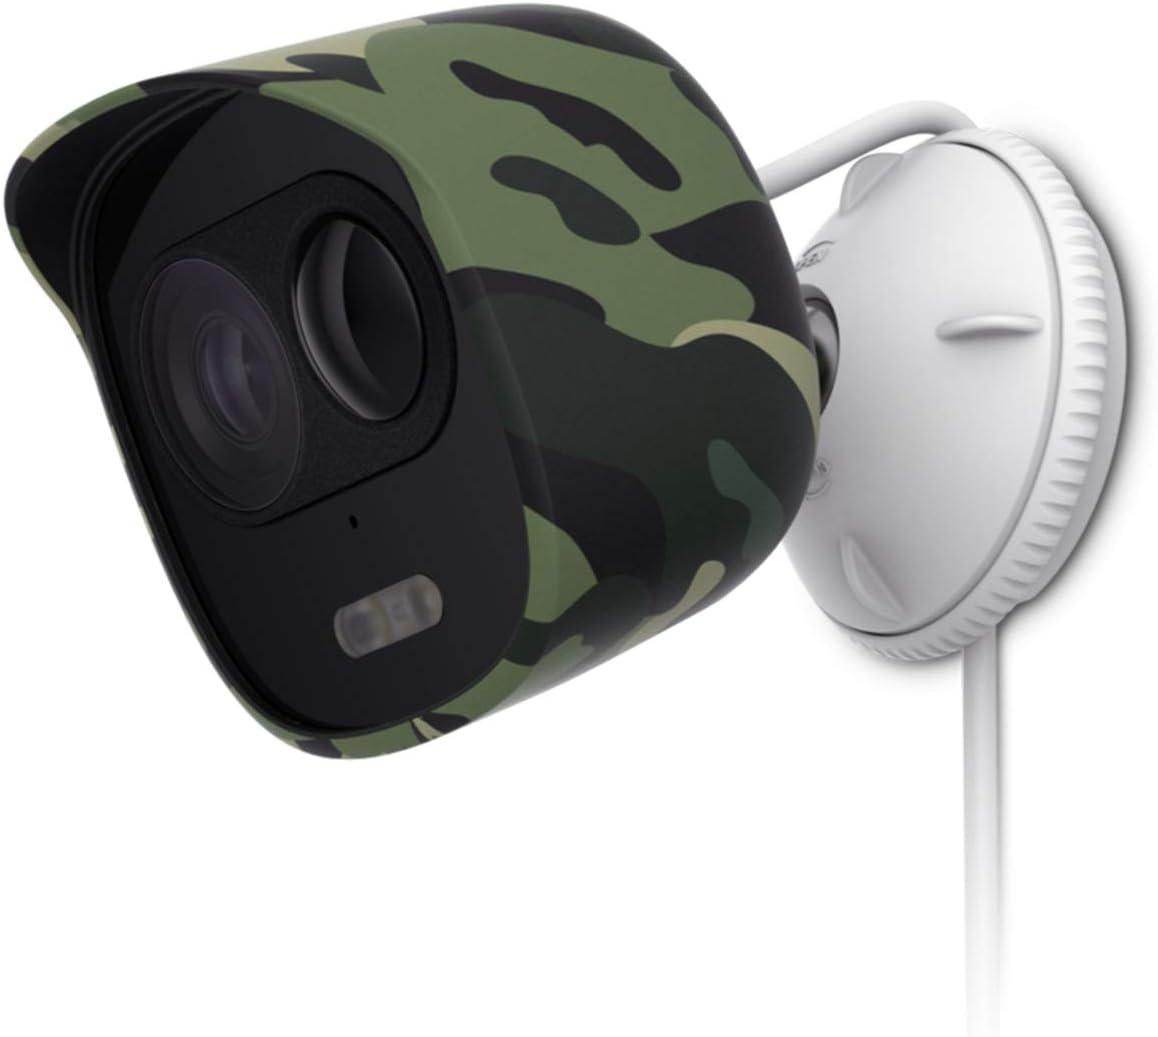 Silikon Schutzhülle Für Imou Looc Kamera Tarnfarben Baumarkt